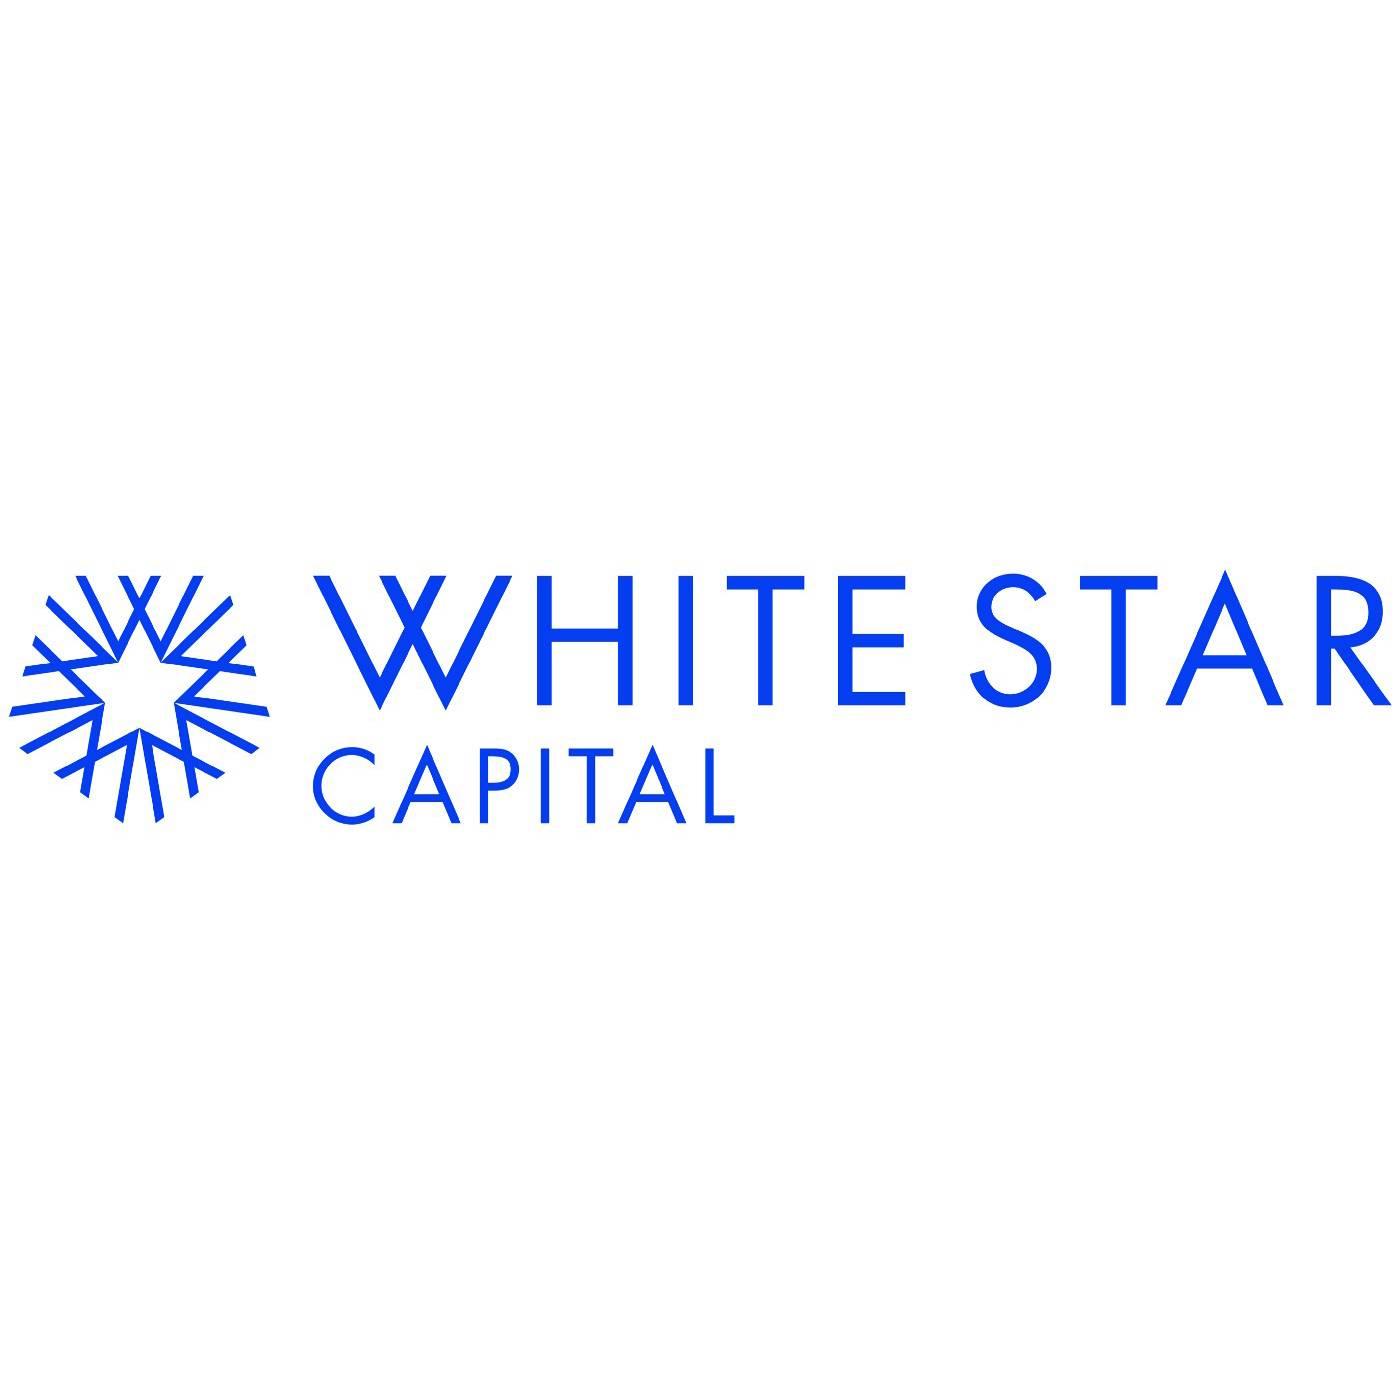 logo du fond  White Star Capital